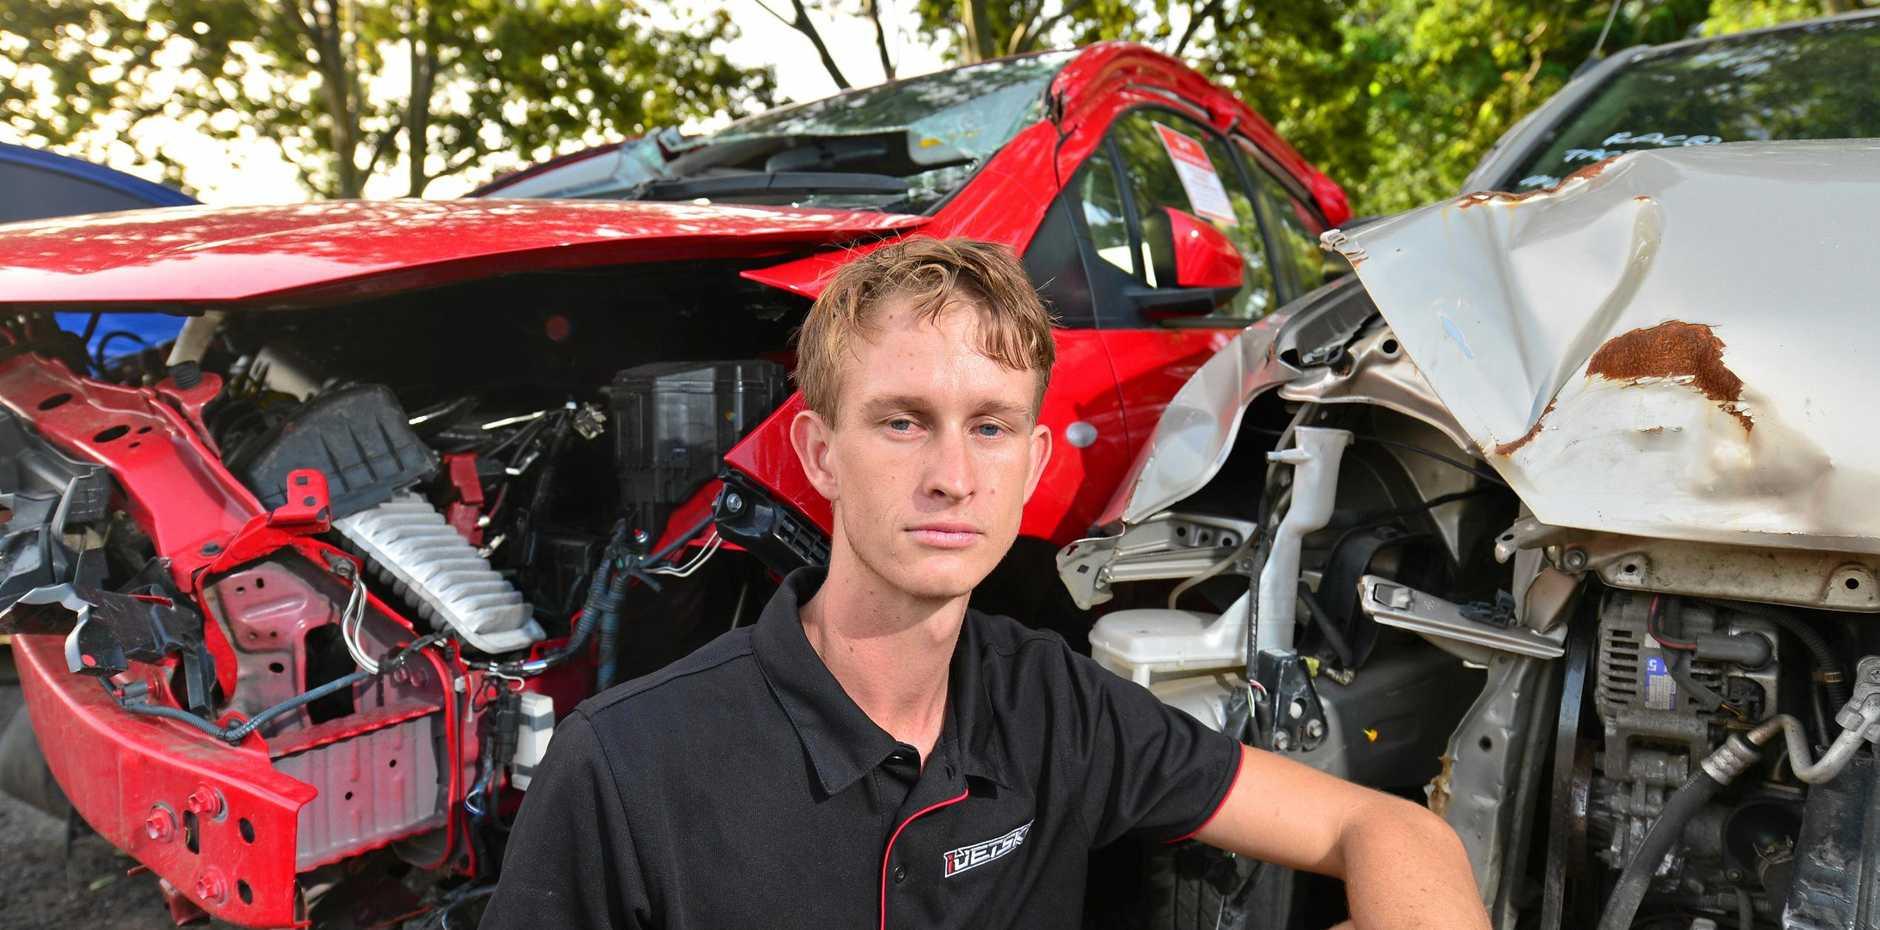 LUCKY SURVIVOR: Gavin Bartkowski, 24 was nearly killed in a head-on collision in 2016.